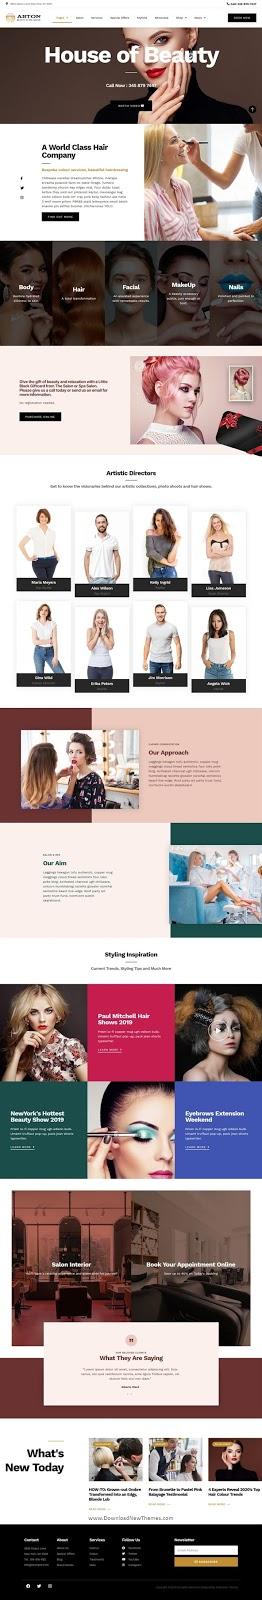 Beauty & Spa Salon Website Template